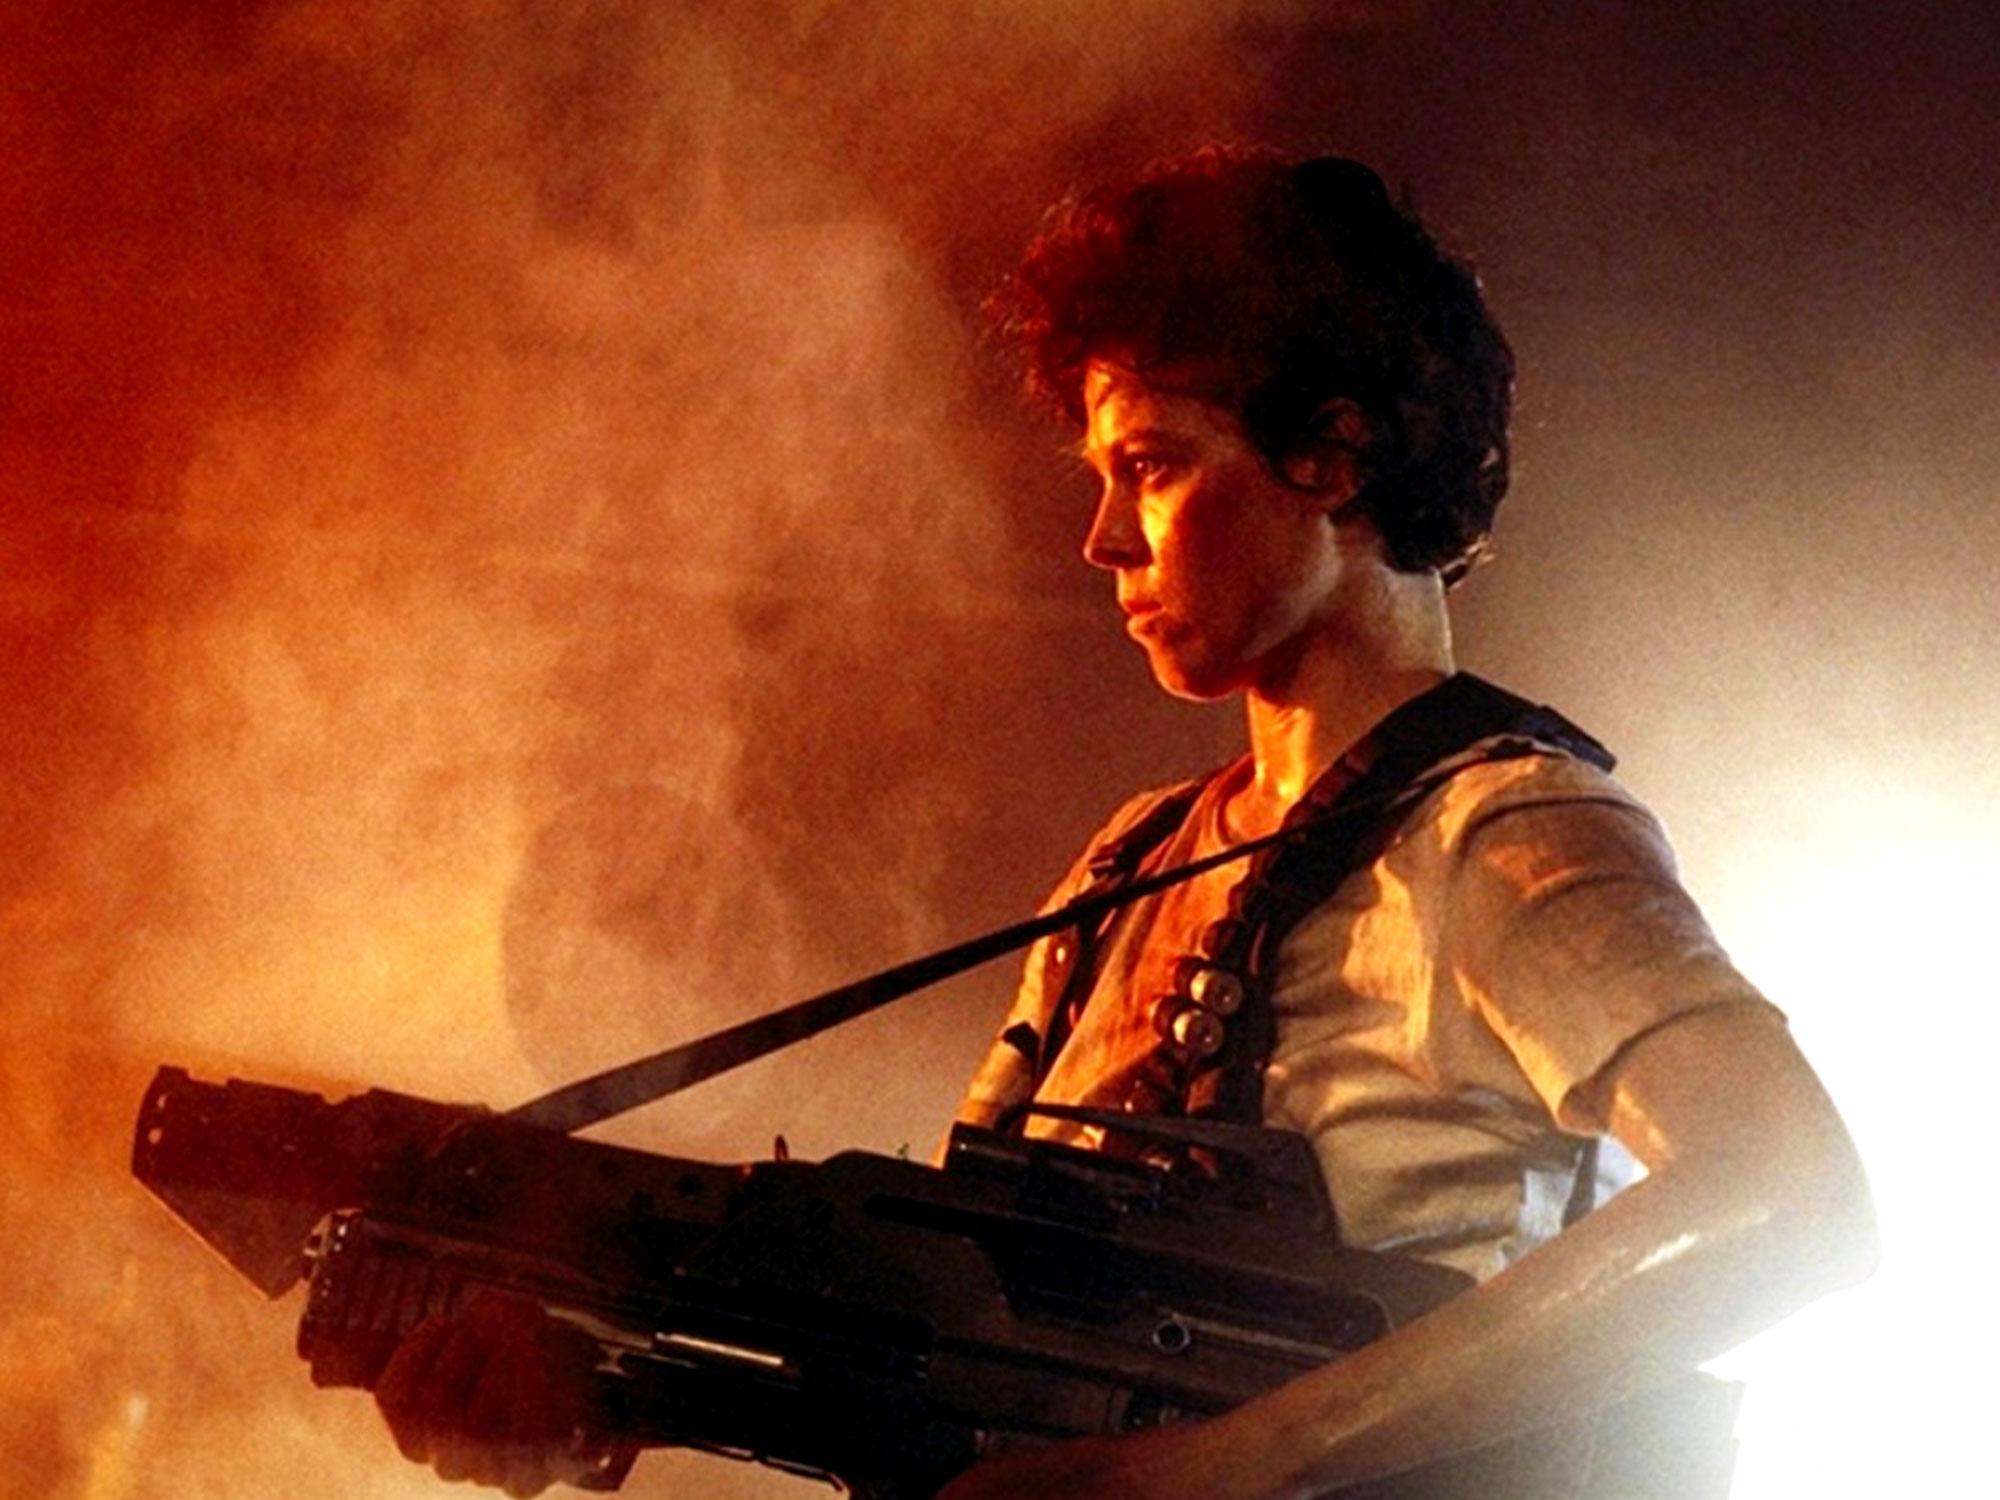 Sigourney Weaver in Aliens 1986